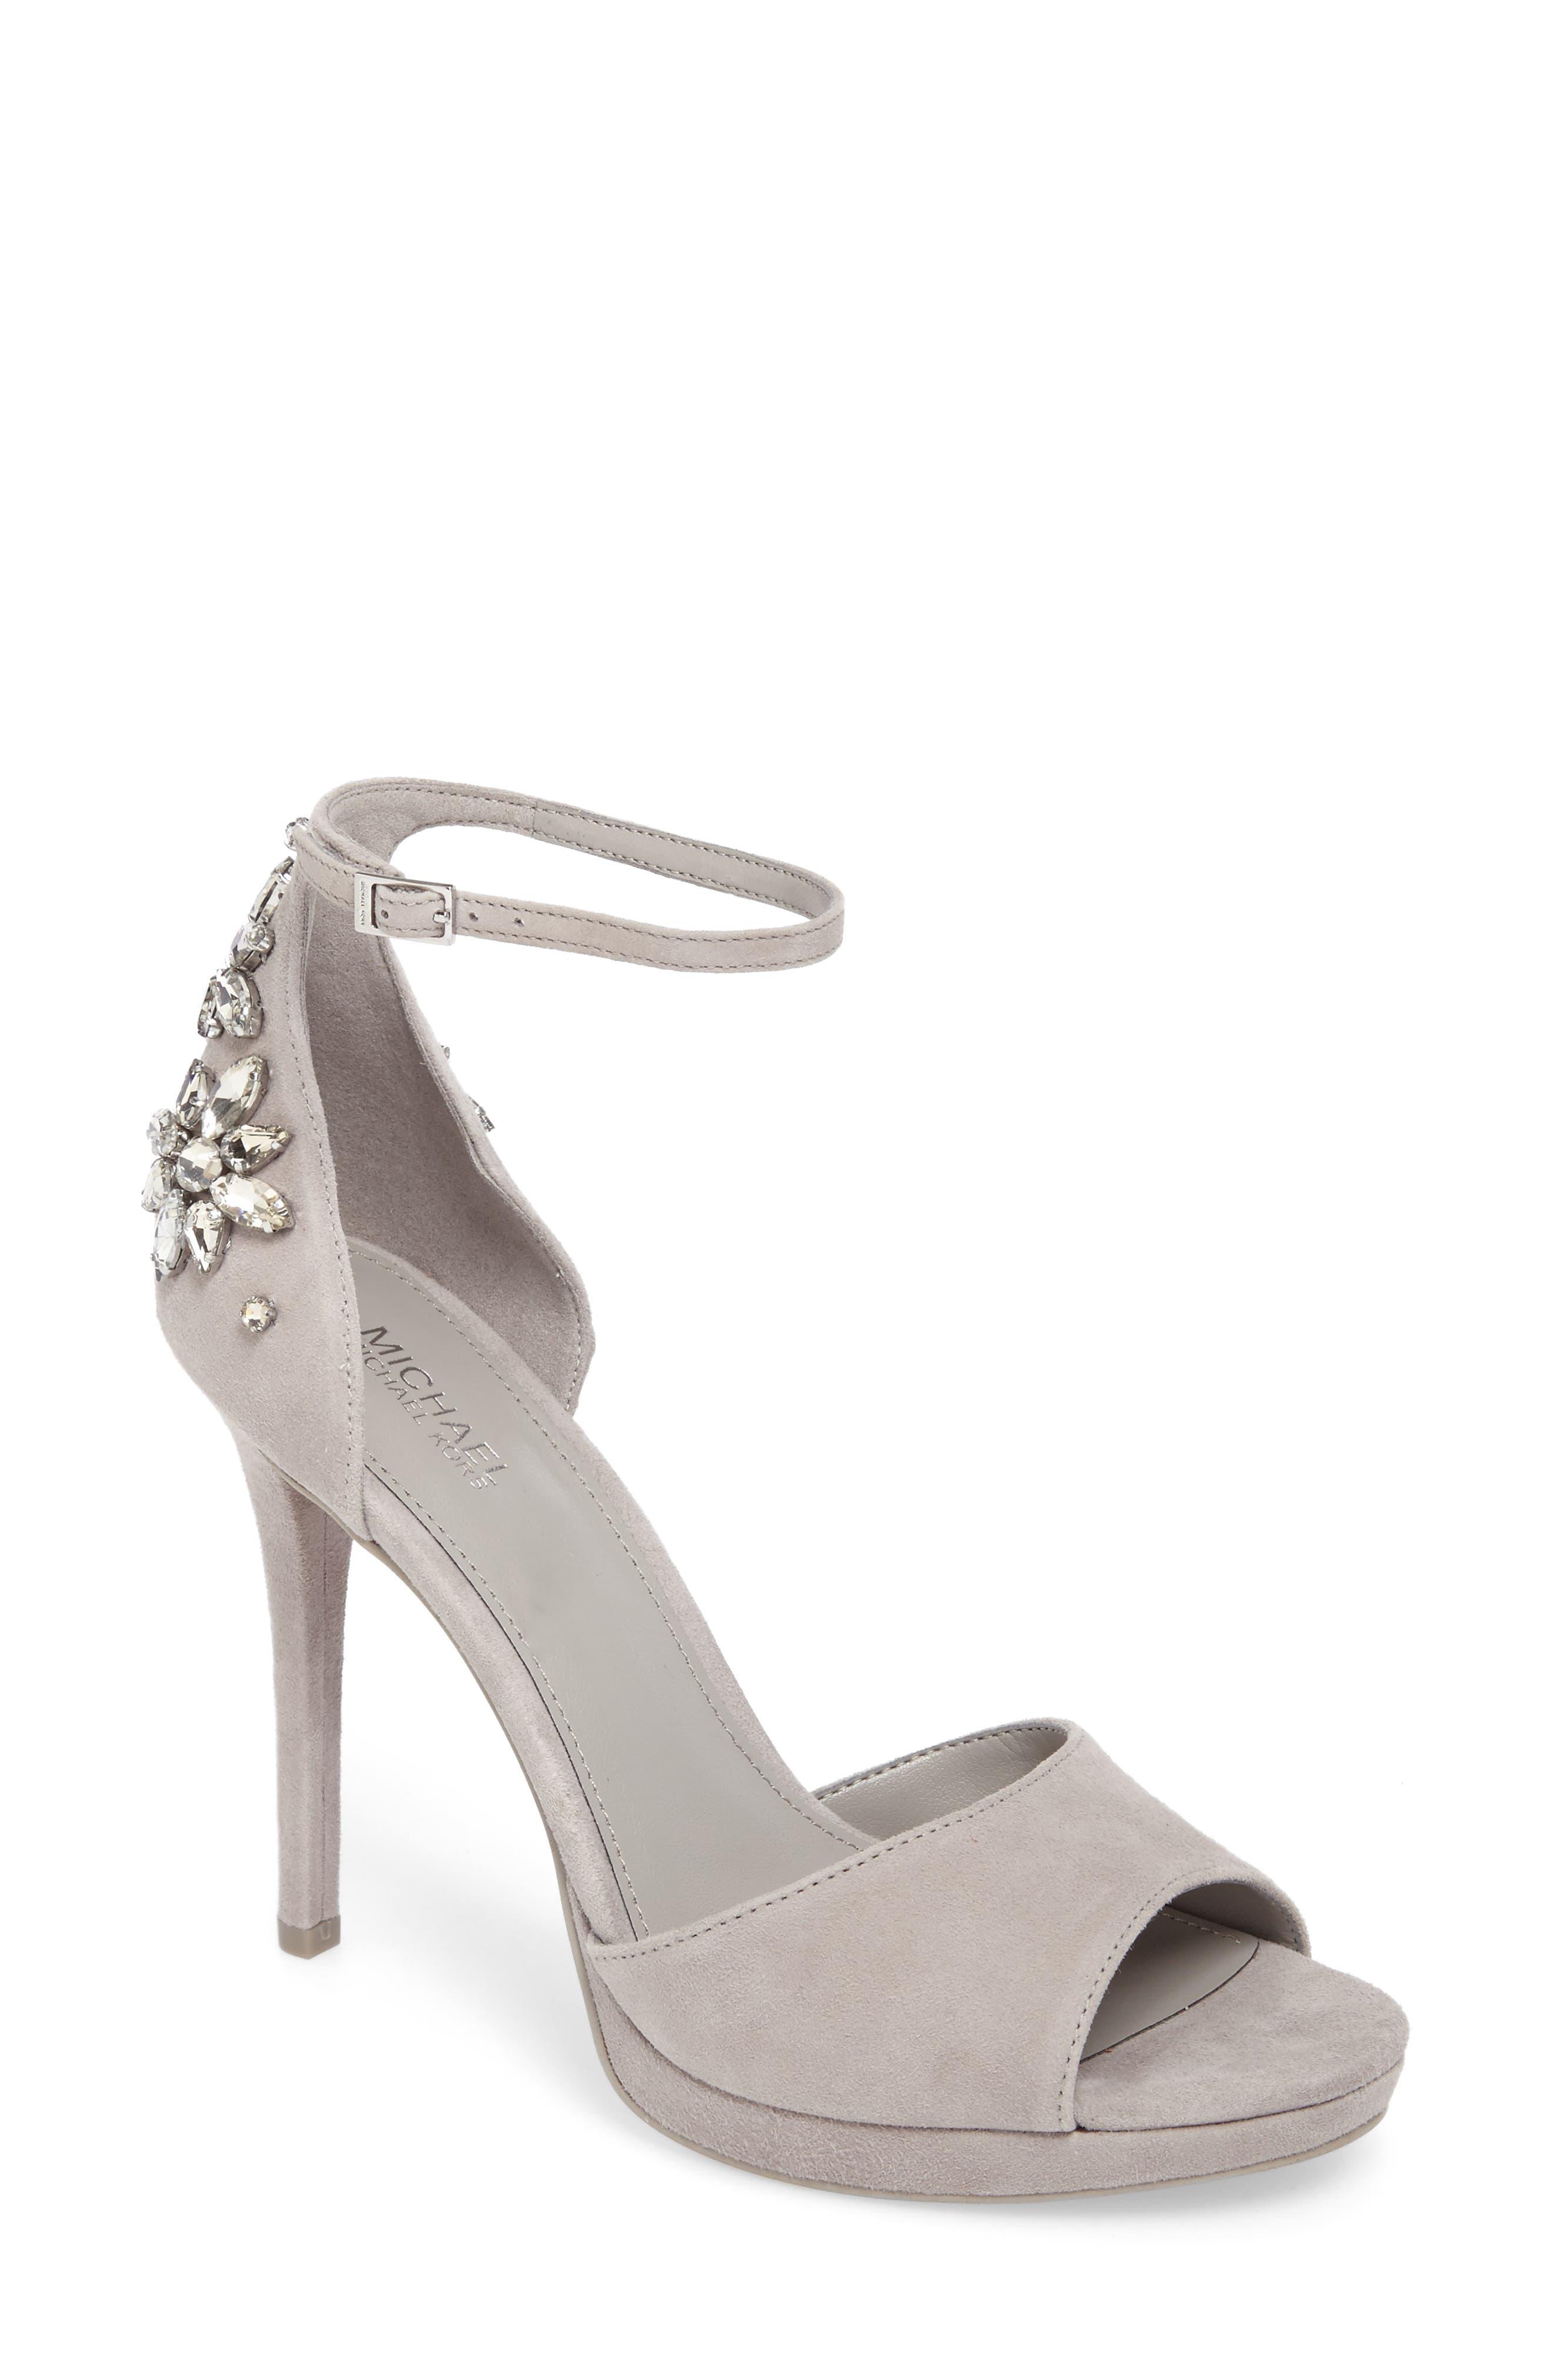 Main Image - MICHAEL Michael Kors Patti Platform Sandal (Women)